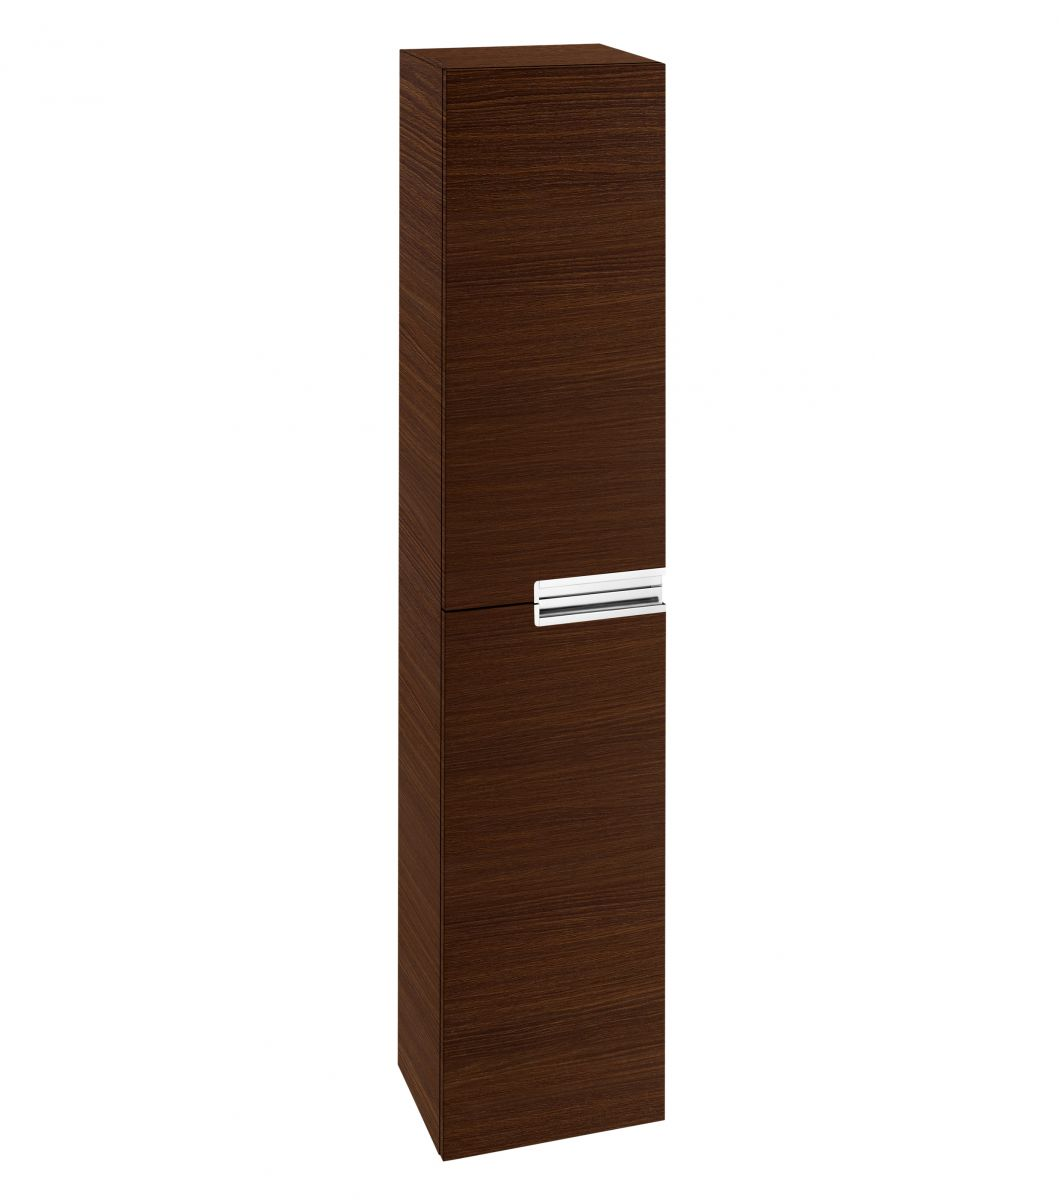 Wooden Bathroom Cabinets Uk roca victoria-n tall column unit : uk bathrooms